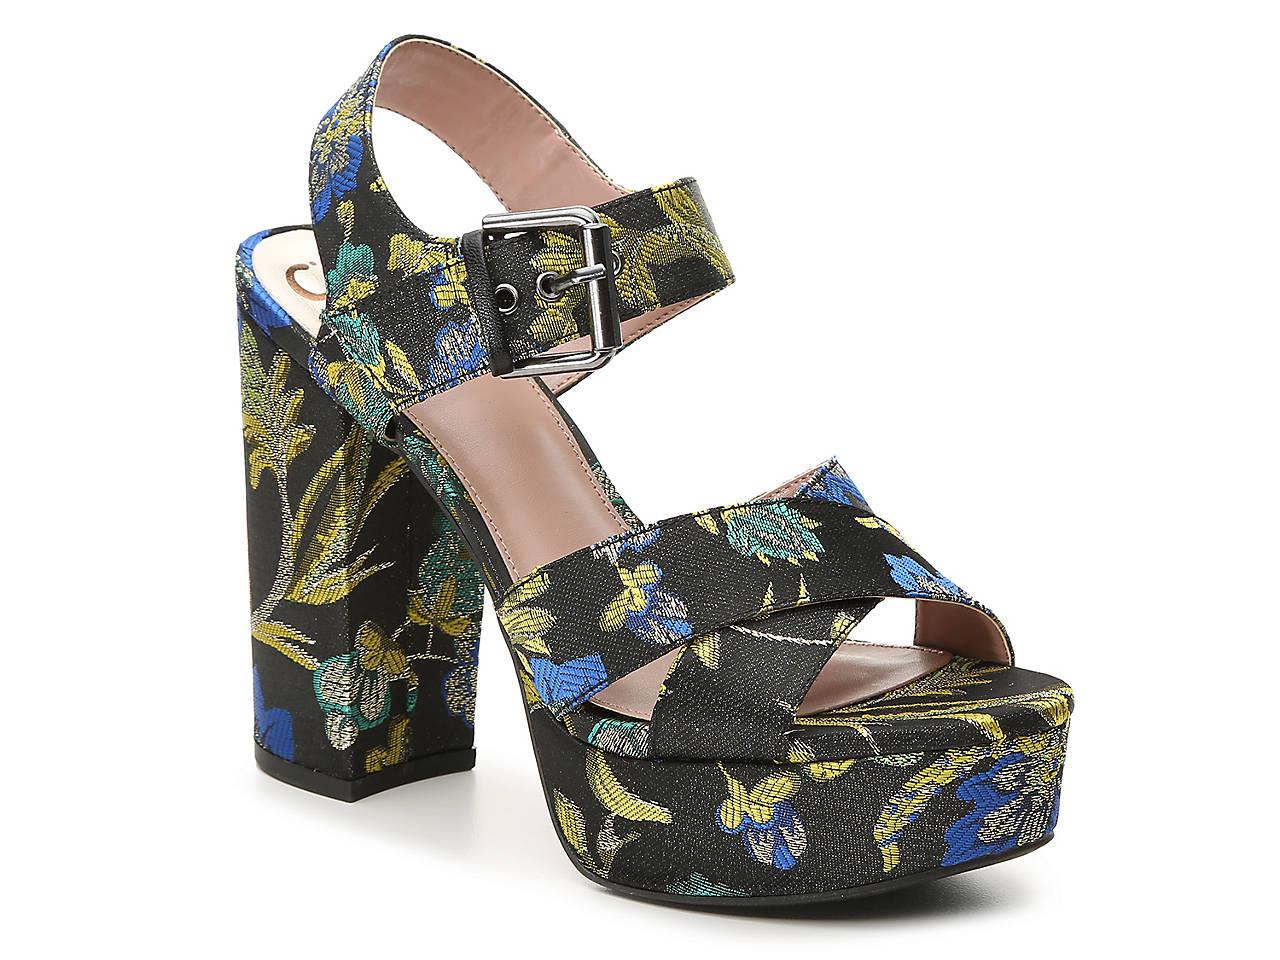 47e1428c8 Circus by Sam Edelman Maria Sandal Women s Shoes